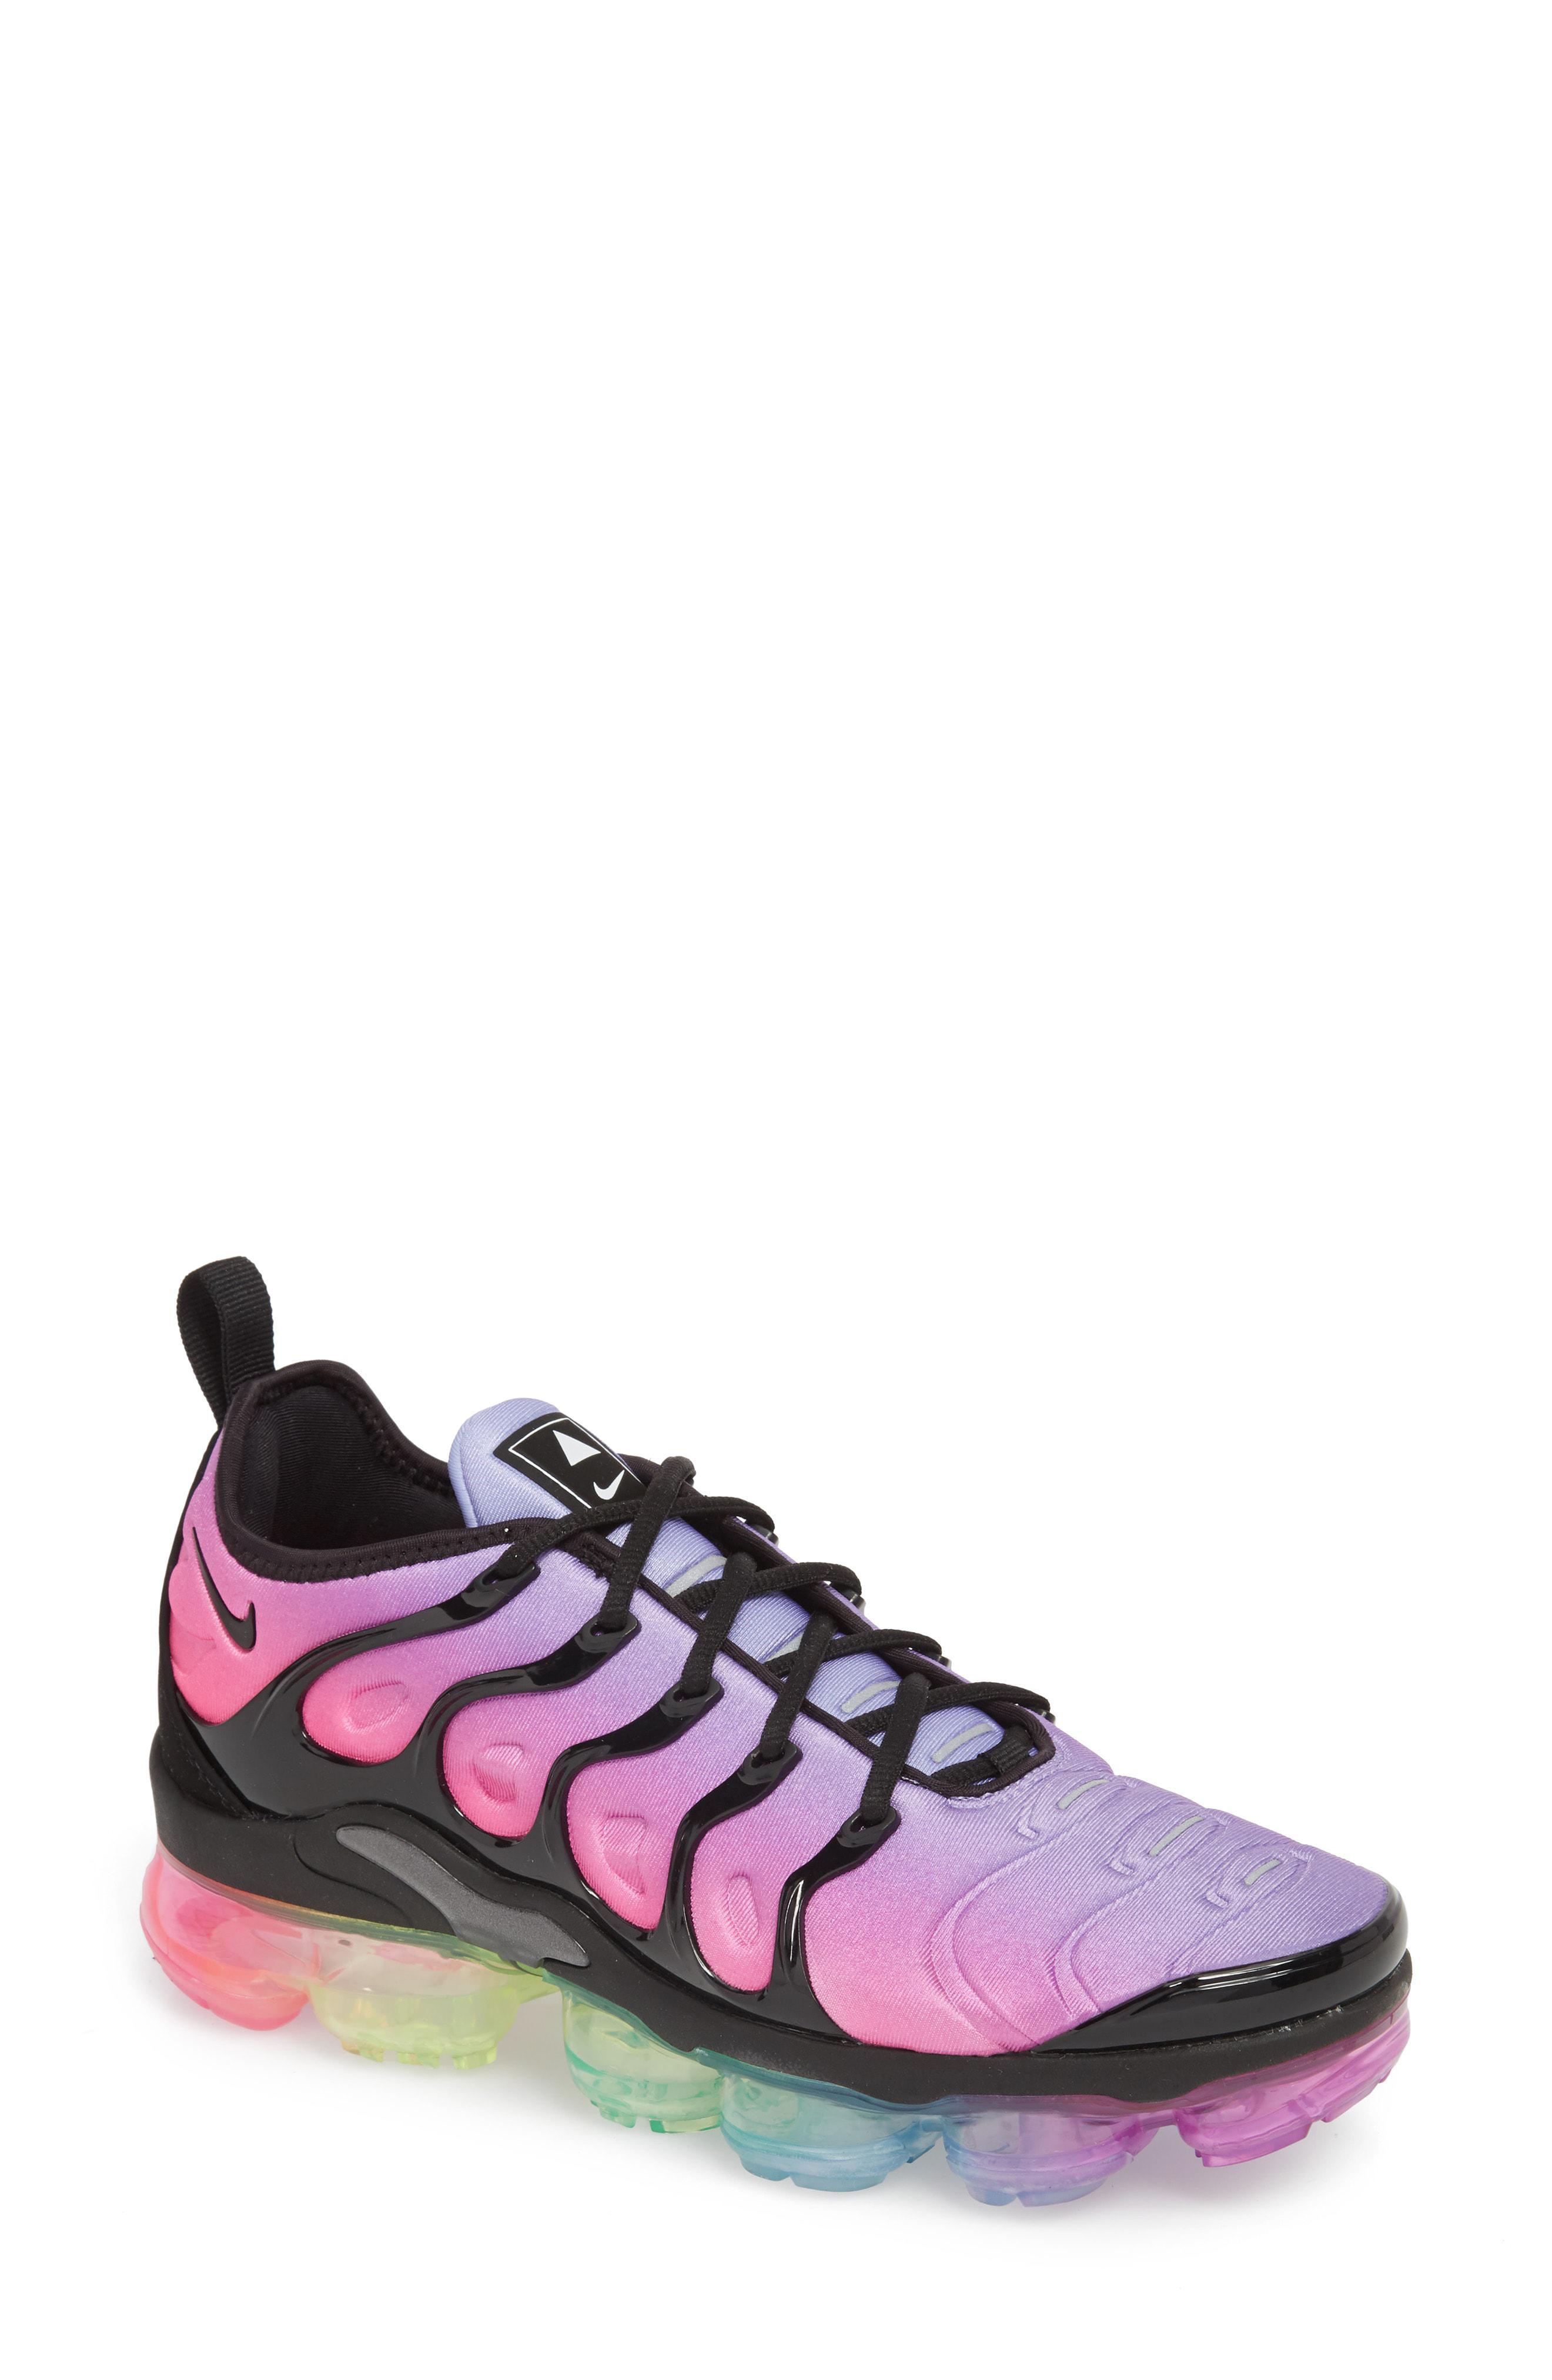 19b5afba4df5 Lyst - Nike Nordstrom X Air Vapormax Plus Betrue Running Shoe in Black